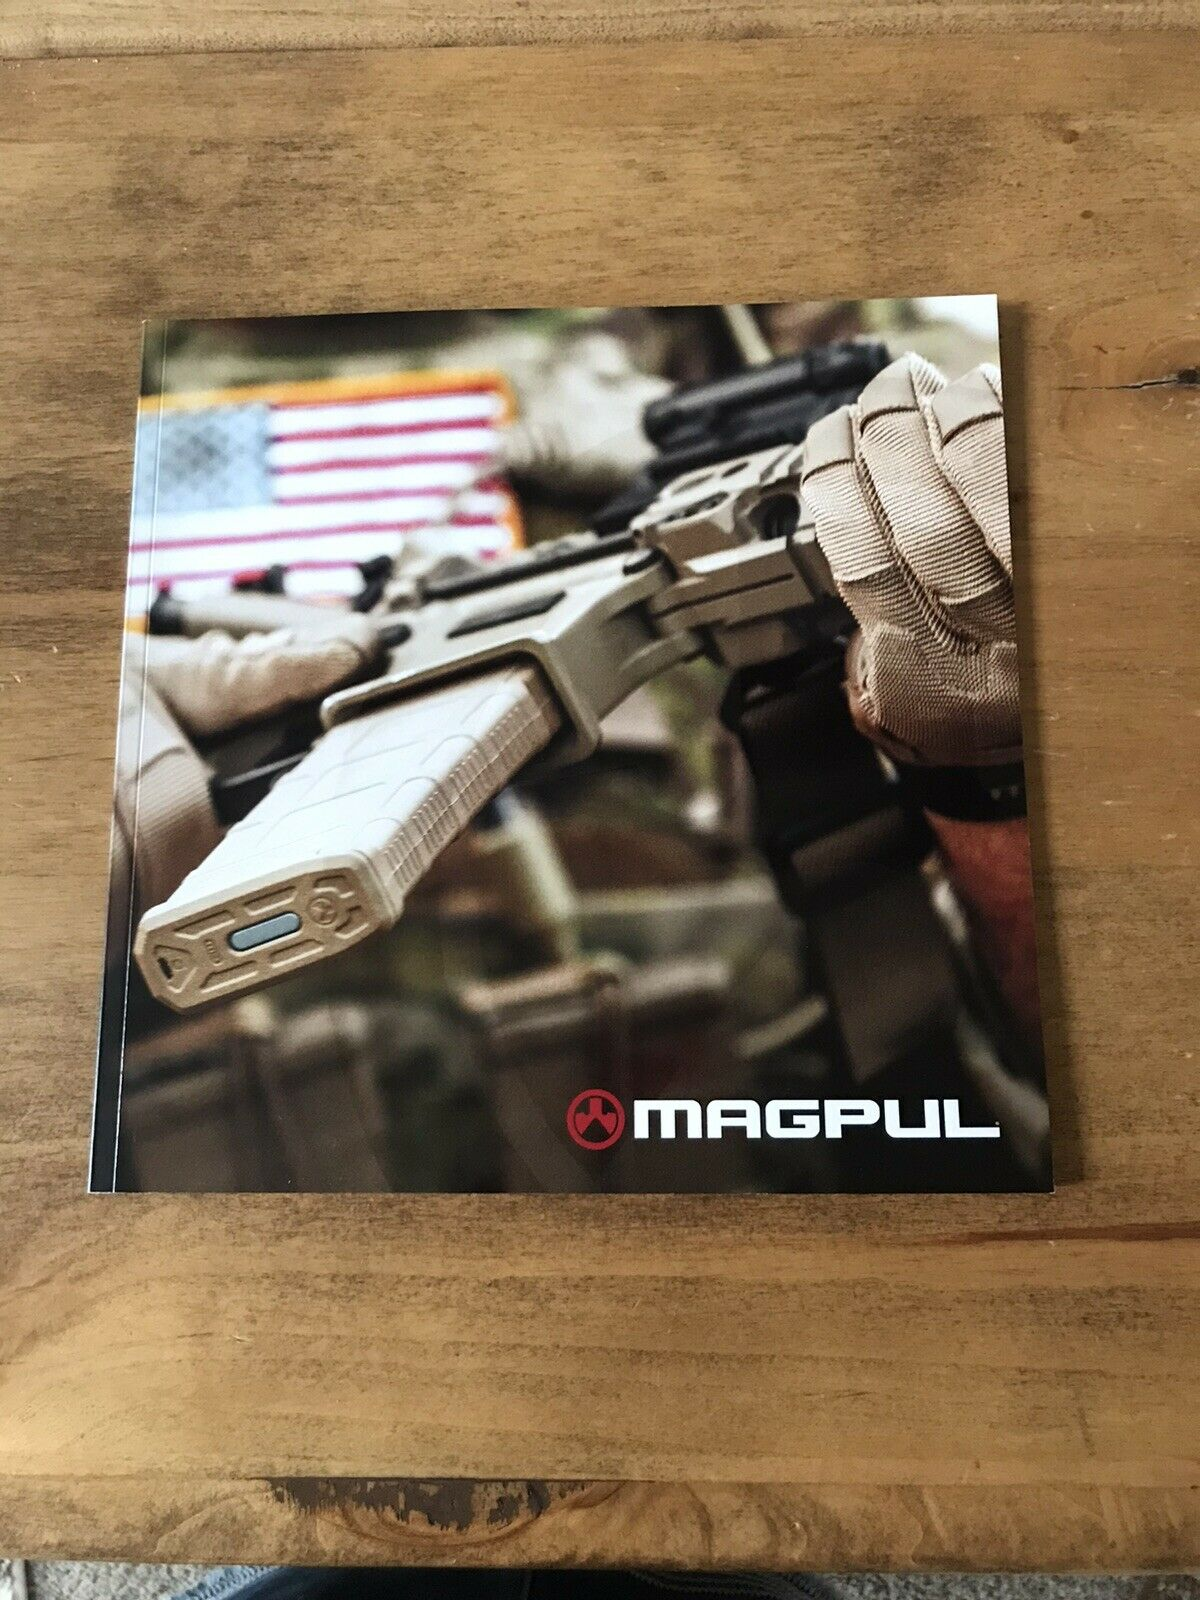 Magpul 2020 Product Catalog Shot Show Vegas